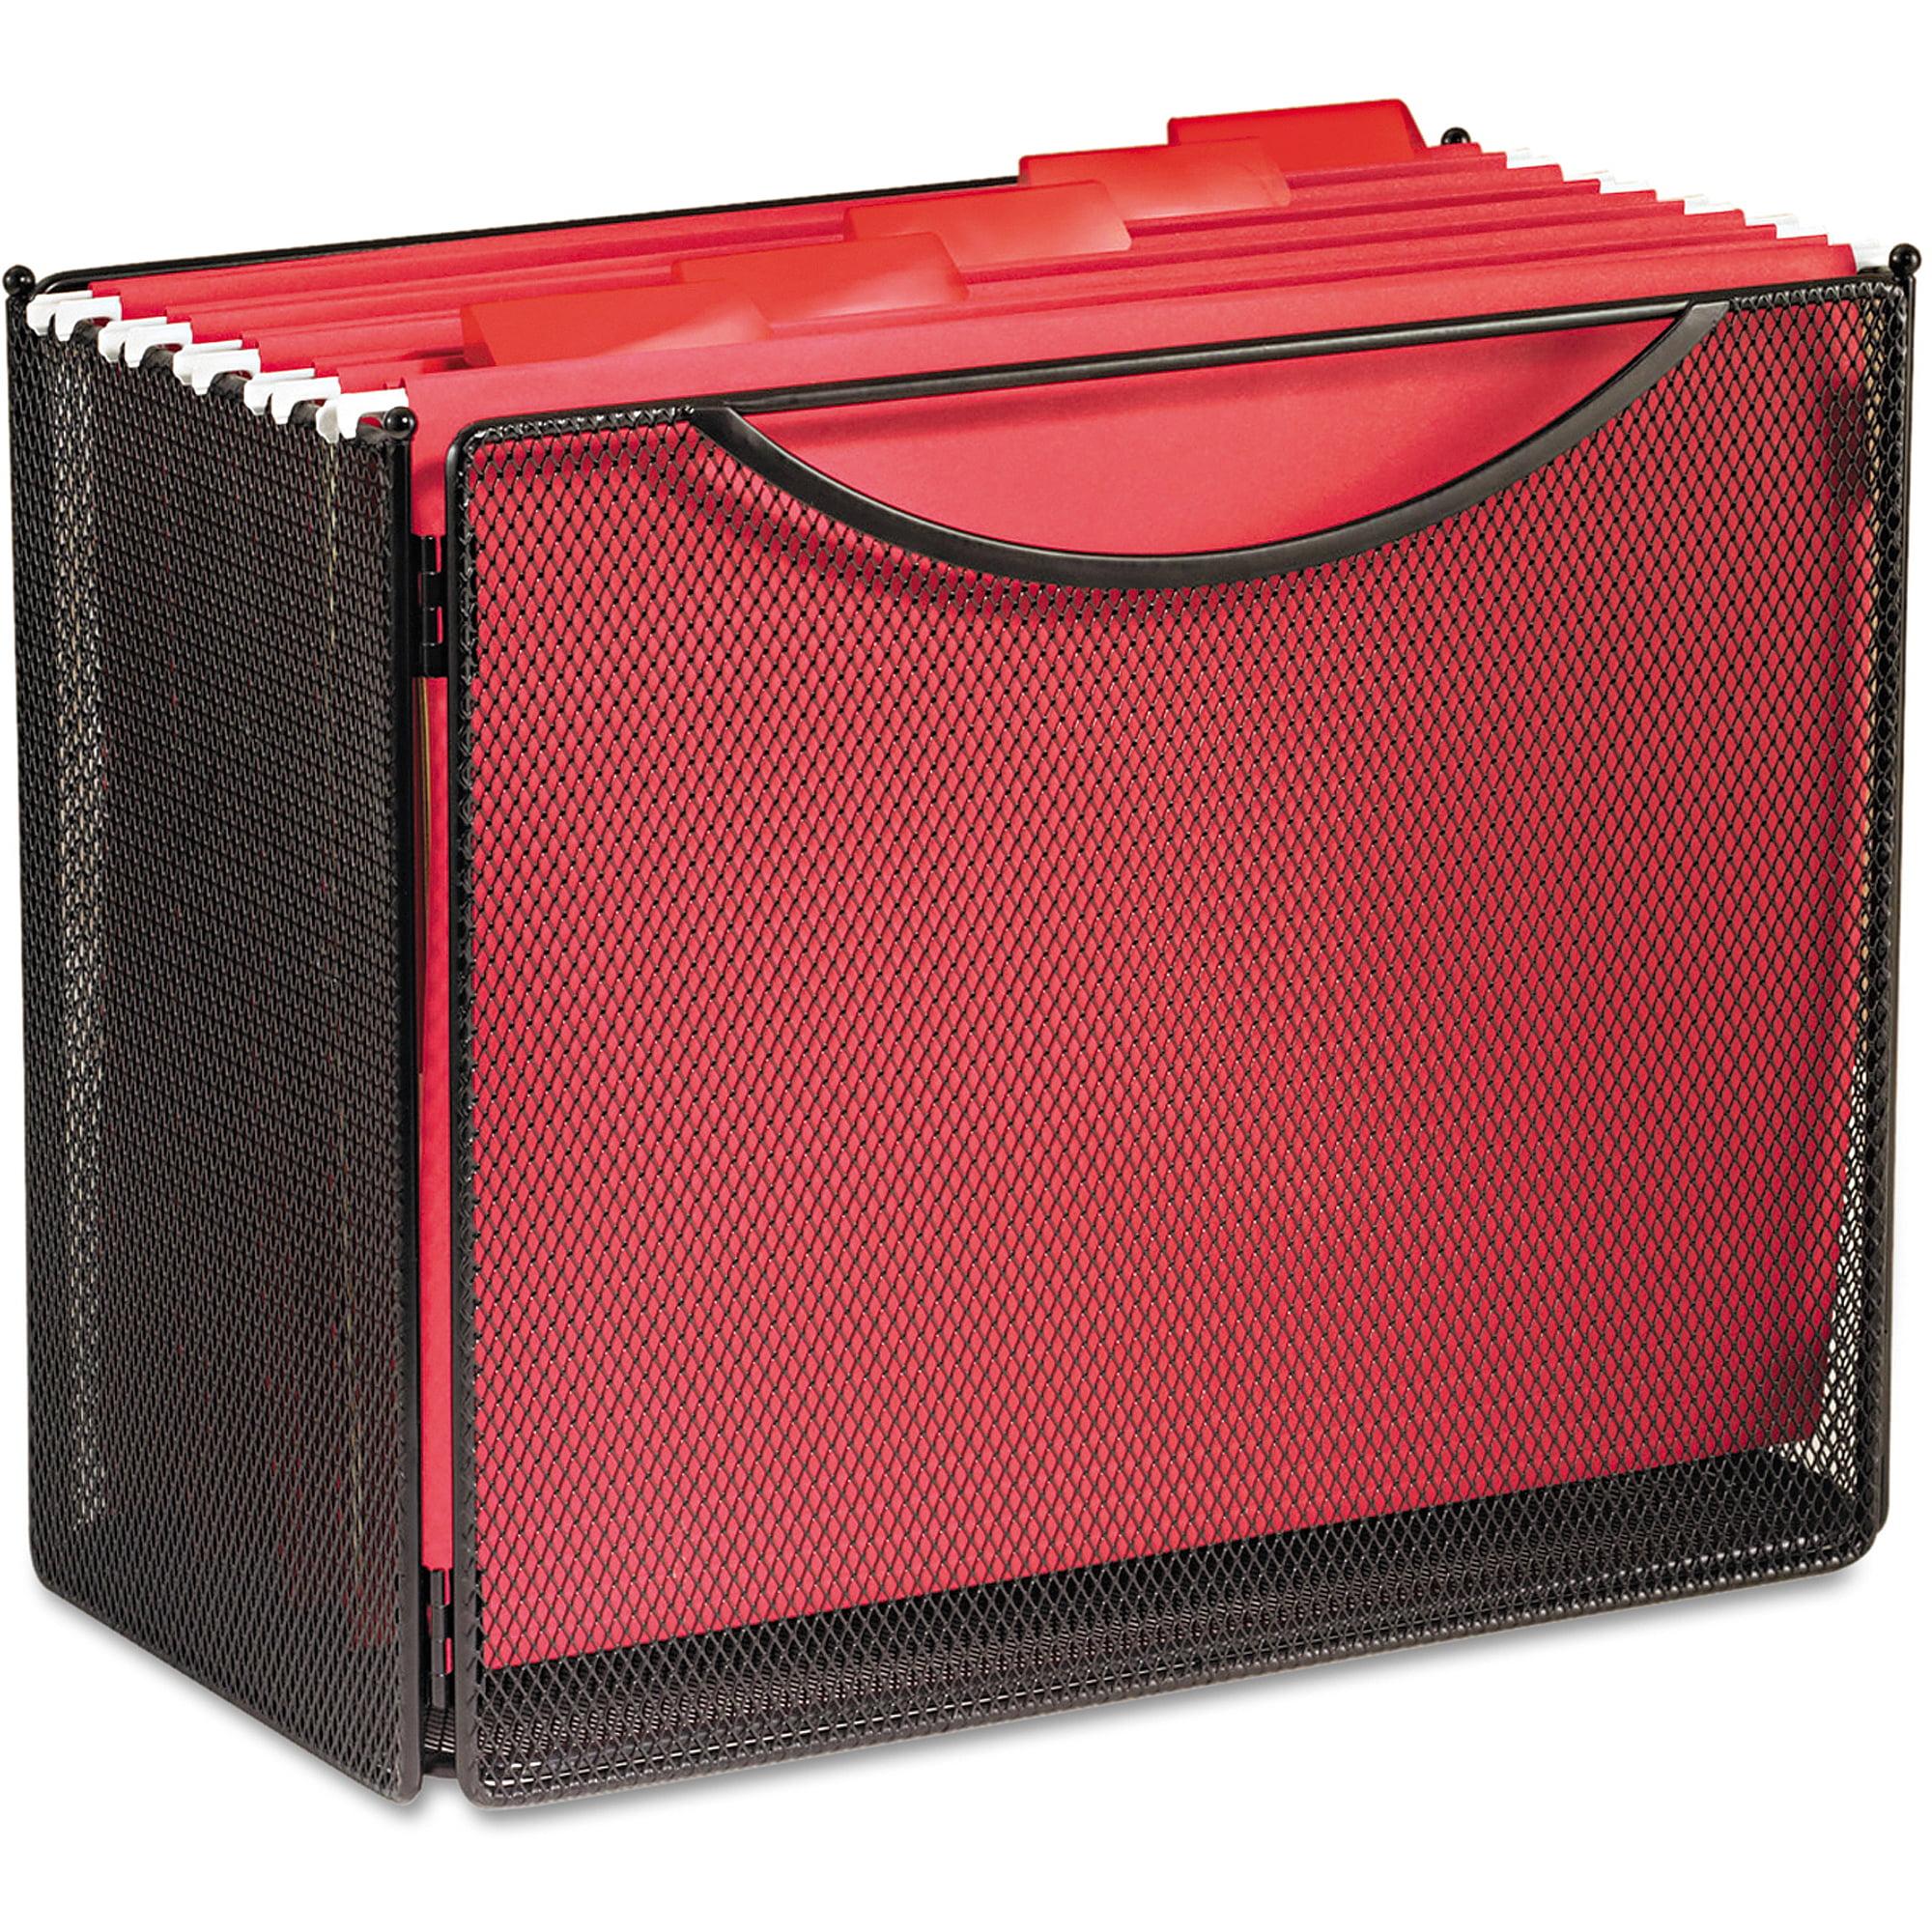 Safco Desktop File Storage Box, Steel Mesh, 12-1/2w x 7d x 10h